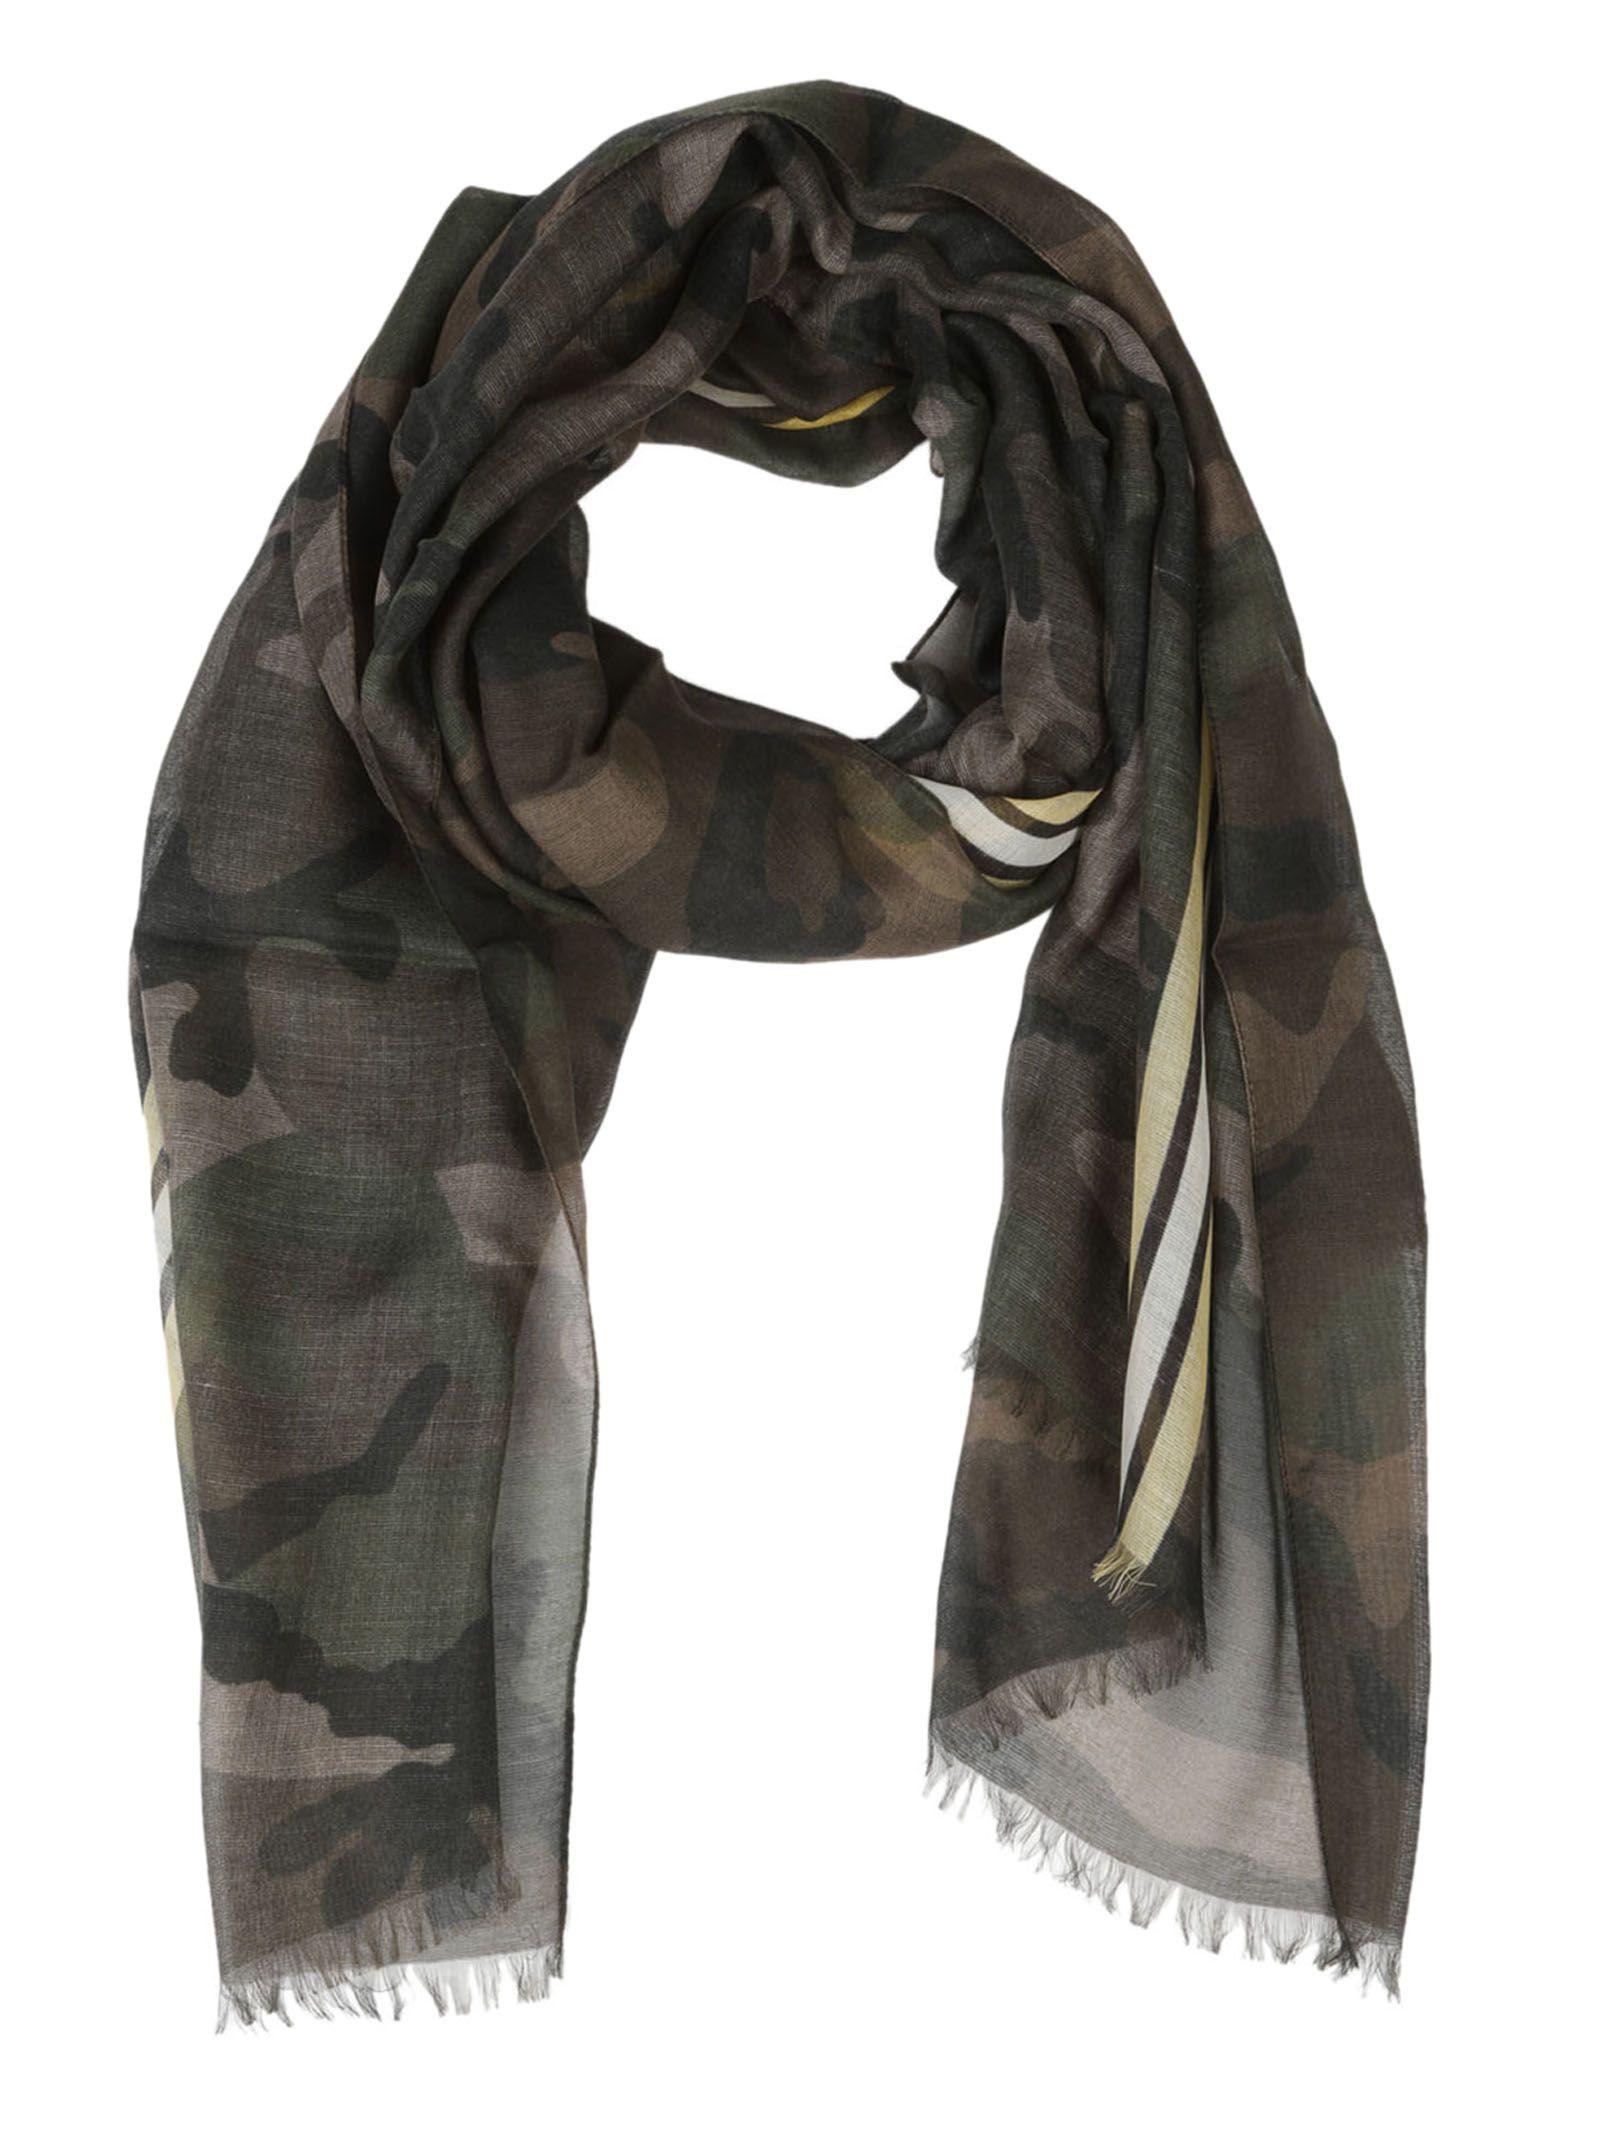 Valentino Army Camouflage Scarf